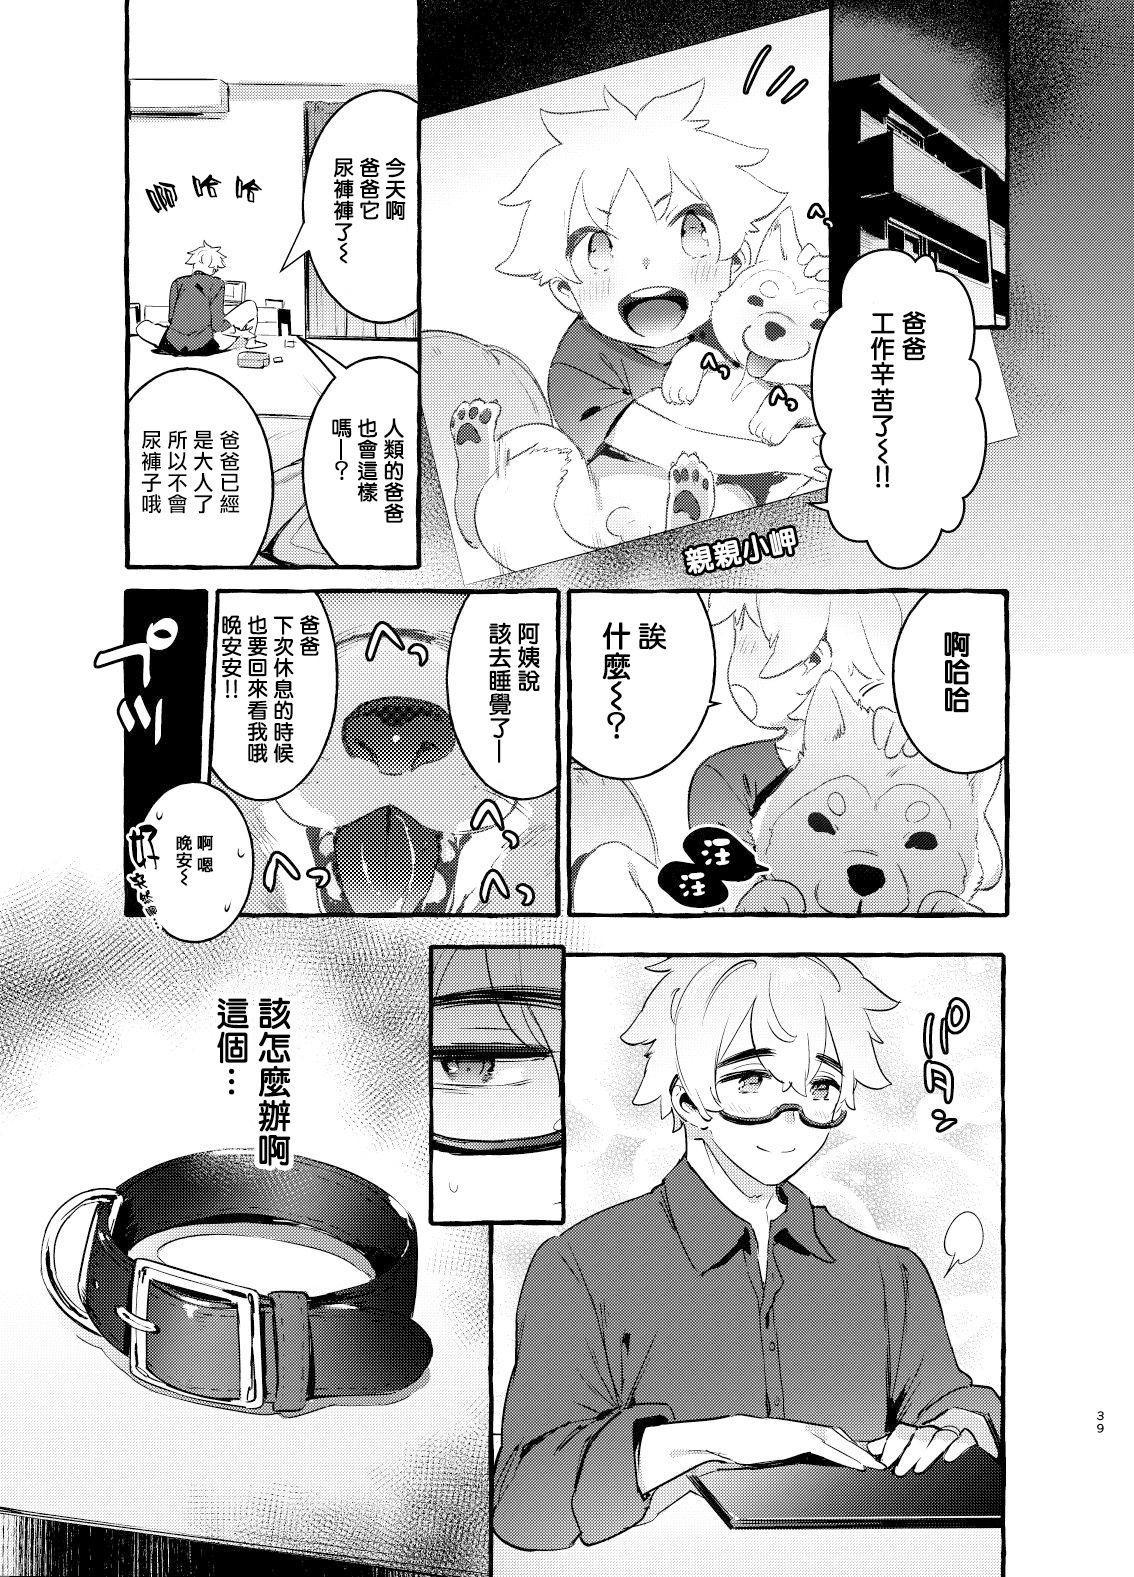 [Otosan no Kurorekishi (Maemukina Do M)]  Wanwan Otou-san   犬系爸爸 01-02 [Chinese] [拾荒者汉化组] [Digital] 39